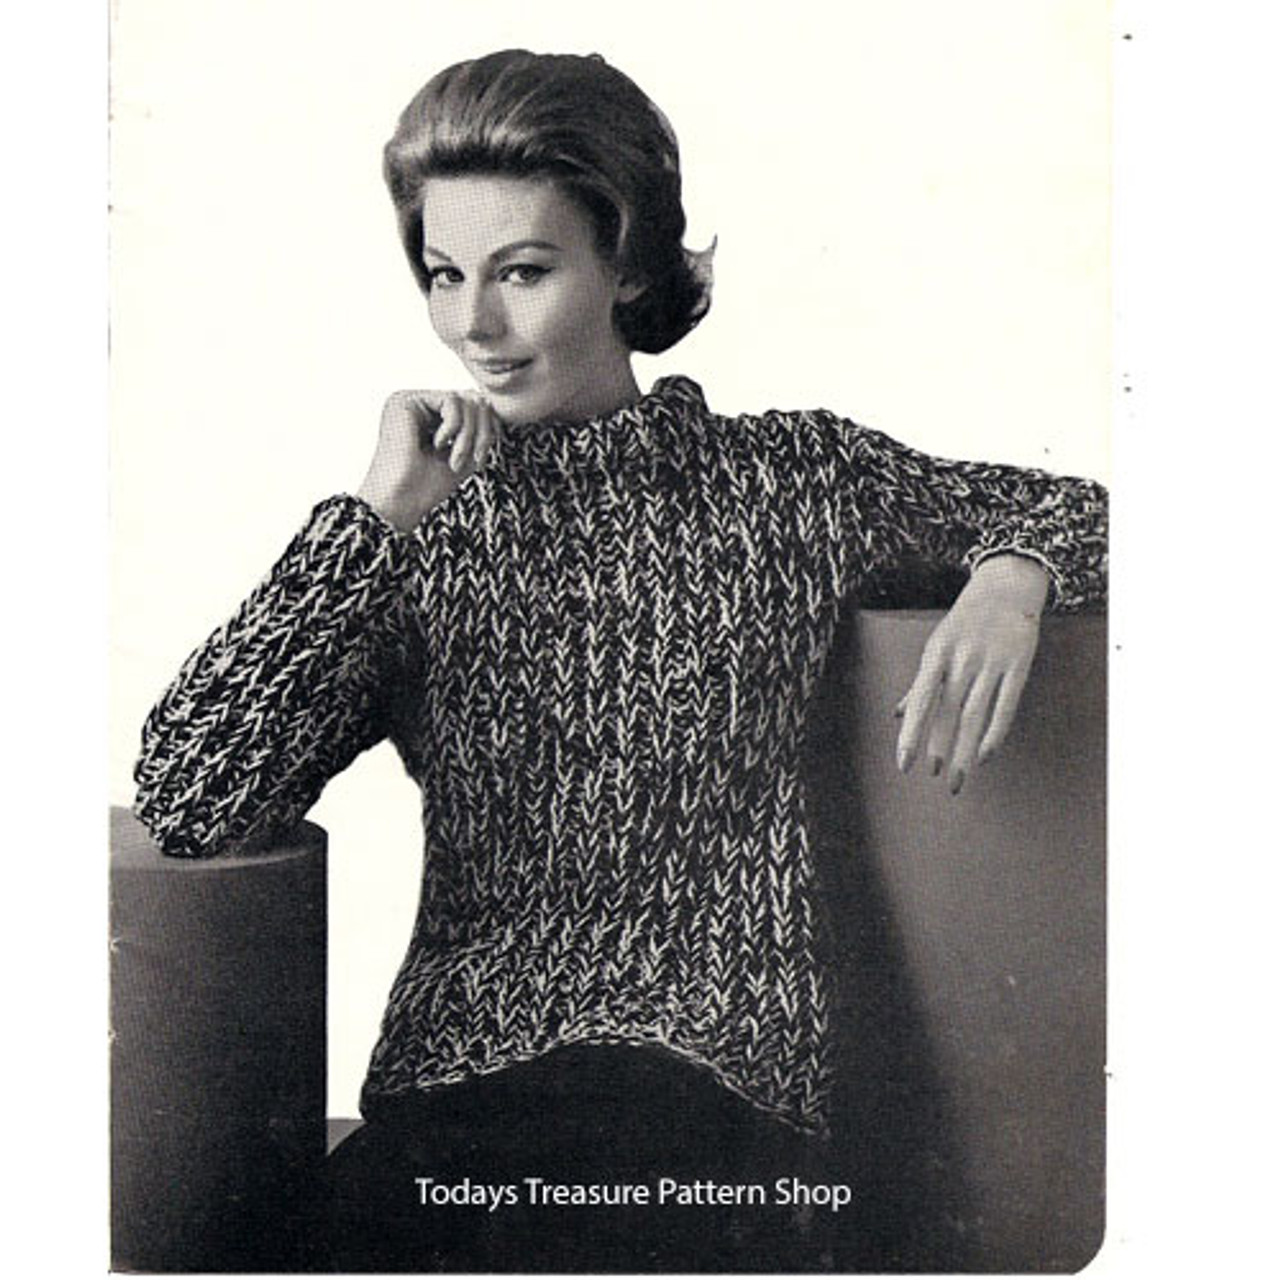 Bulky Tweed Sweater Knitting Pattern